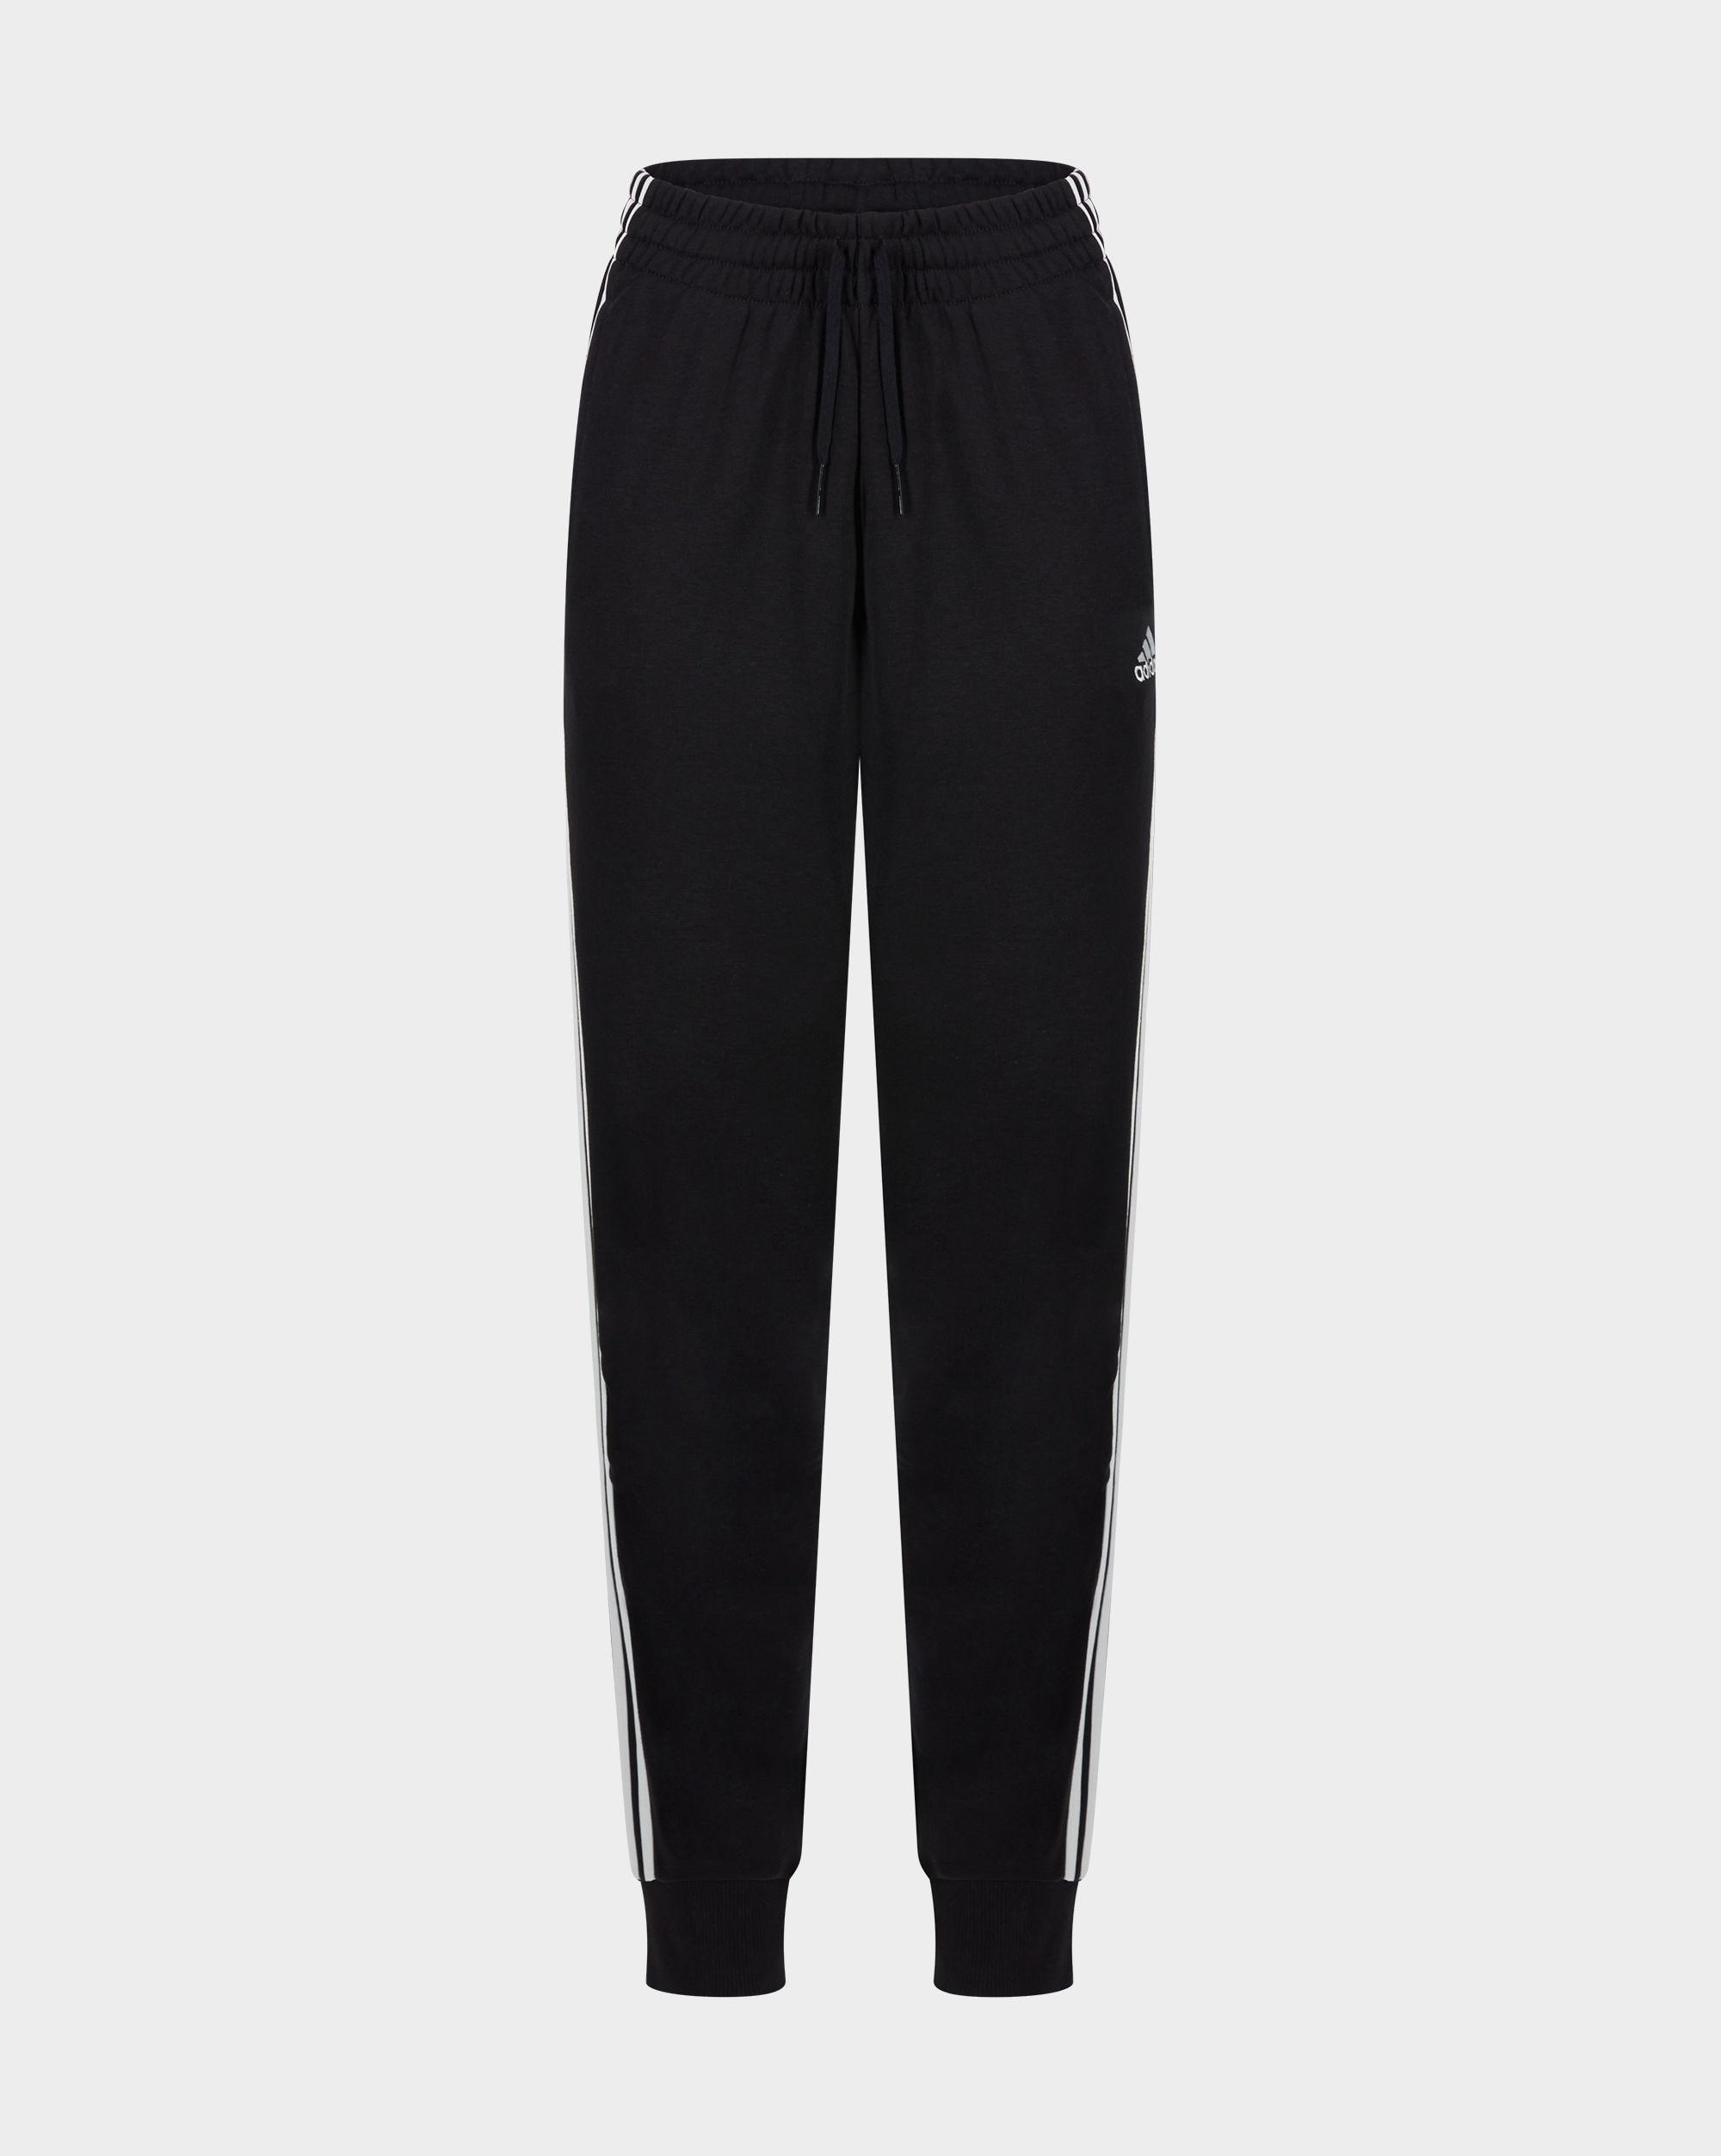 Adidas Pantaloni Essentials French Terry 3-Stripes Donna